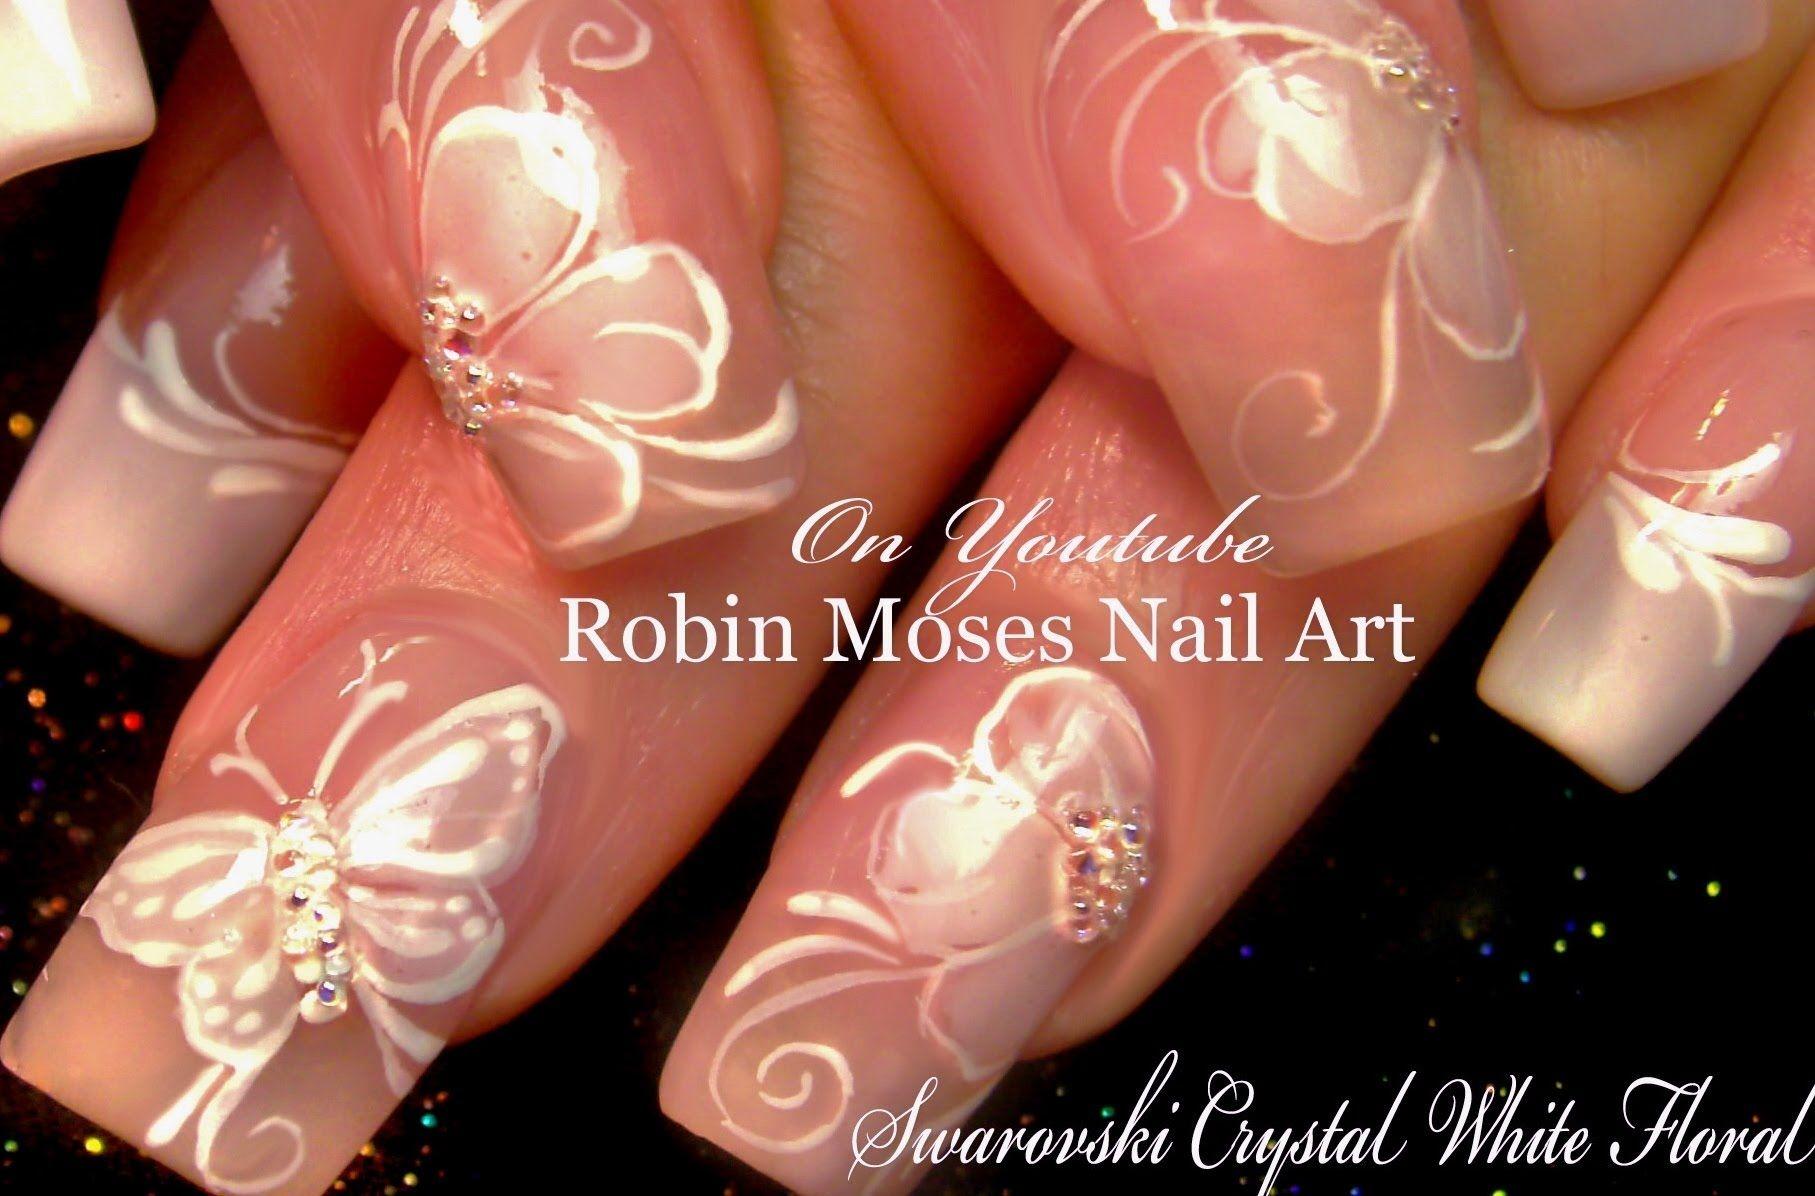 White Flower Nails Diy French Pink Wedding Nail Art Design Tutorial Nail Art Wedding Nail Art Diy Wedding Nail Art Design